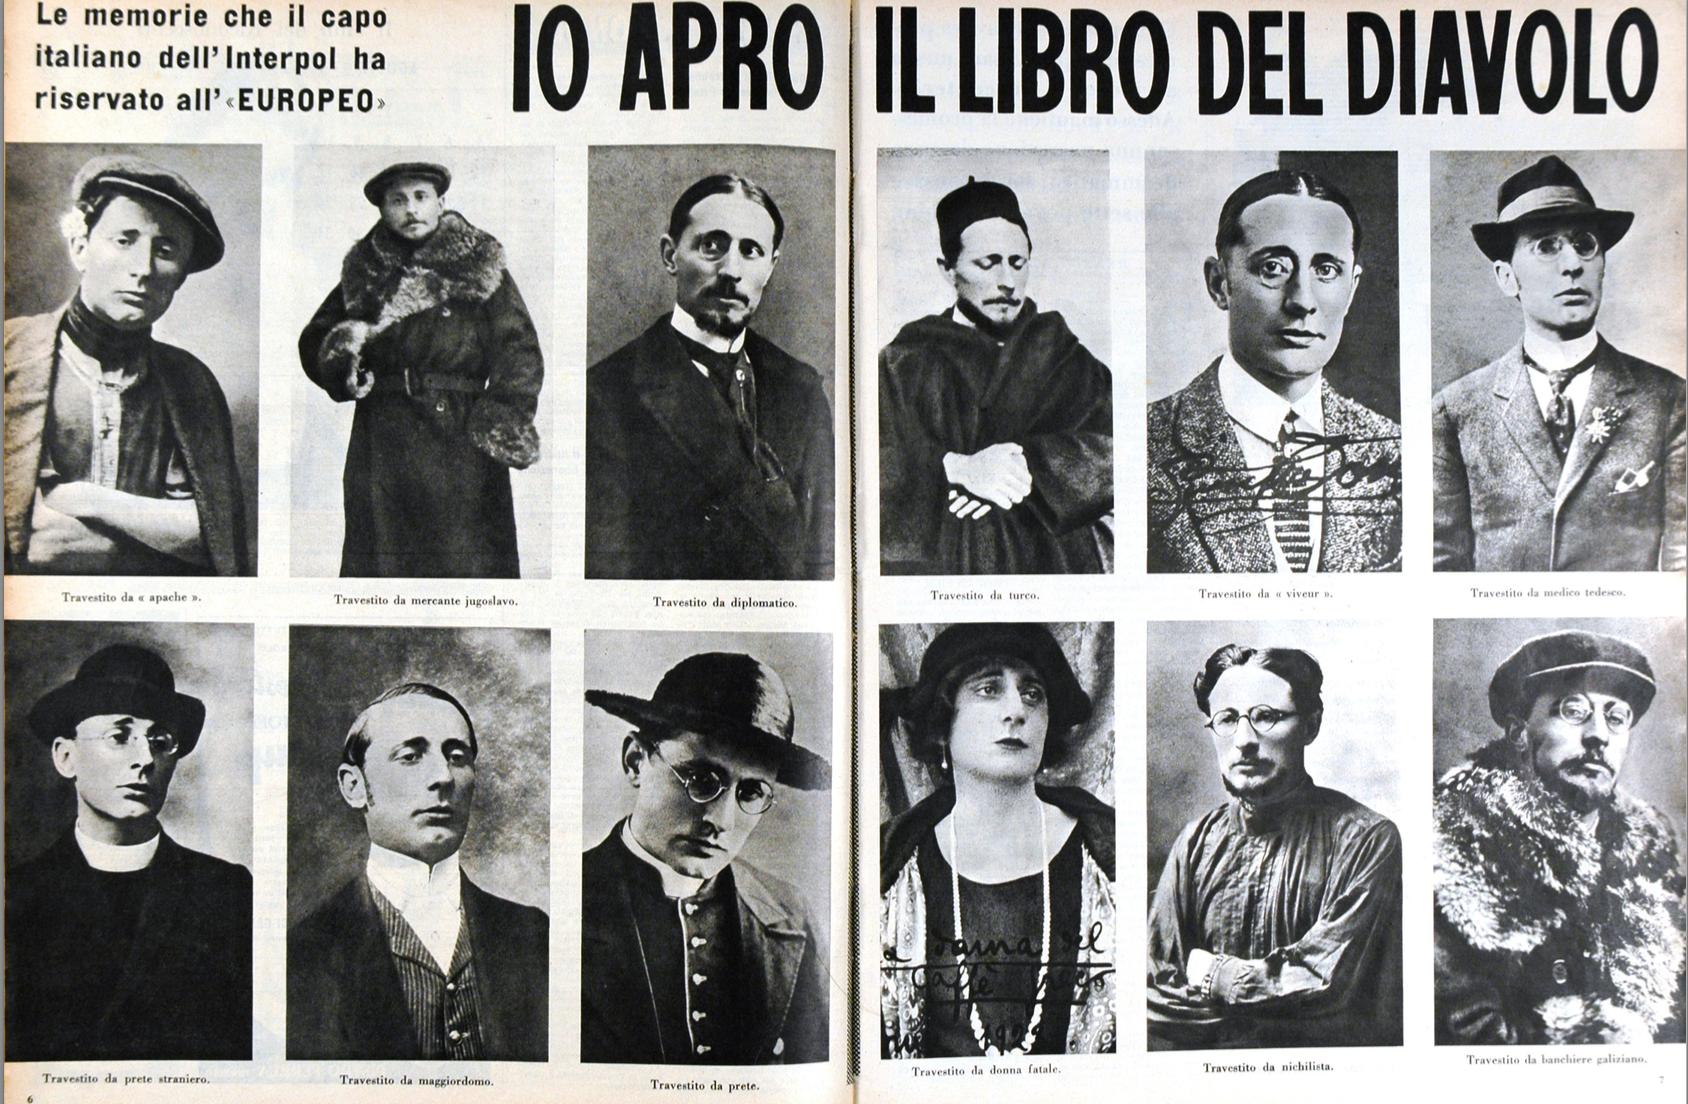 GiuseppeDosi y sus disfraces de investigador - Foto©PoliziaStato